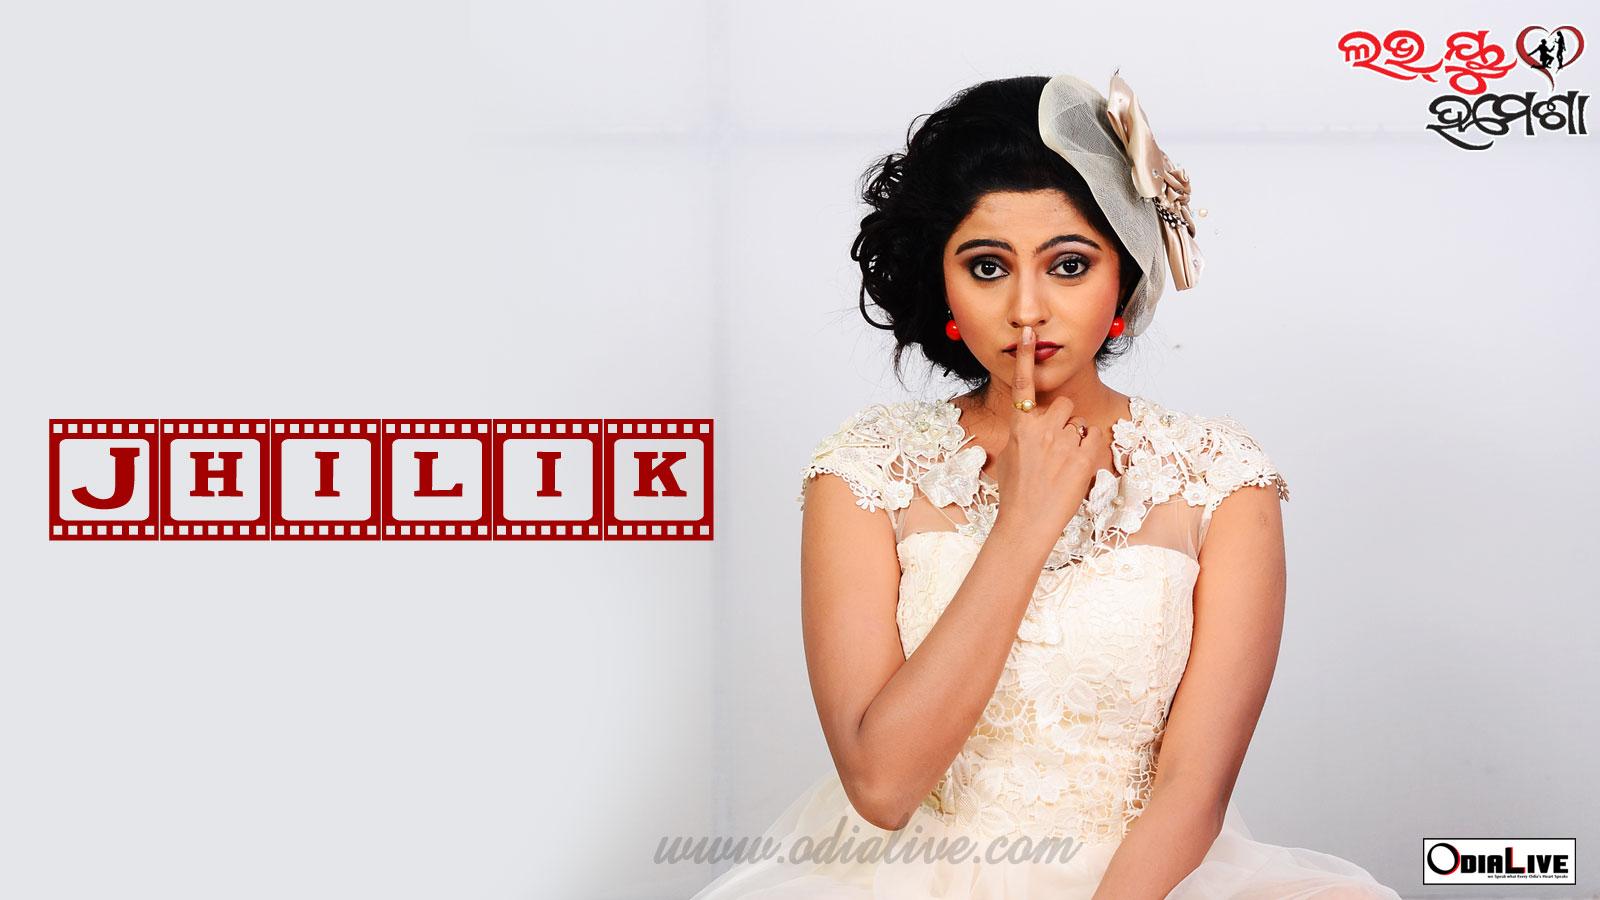 love-u-hamesha-wallpapers-jhilik-odia-actress35